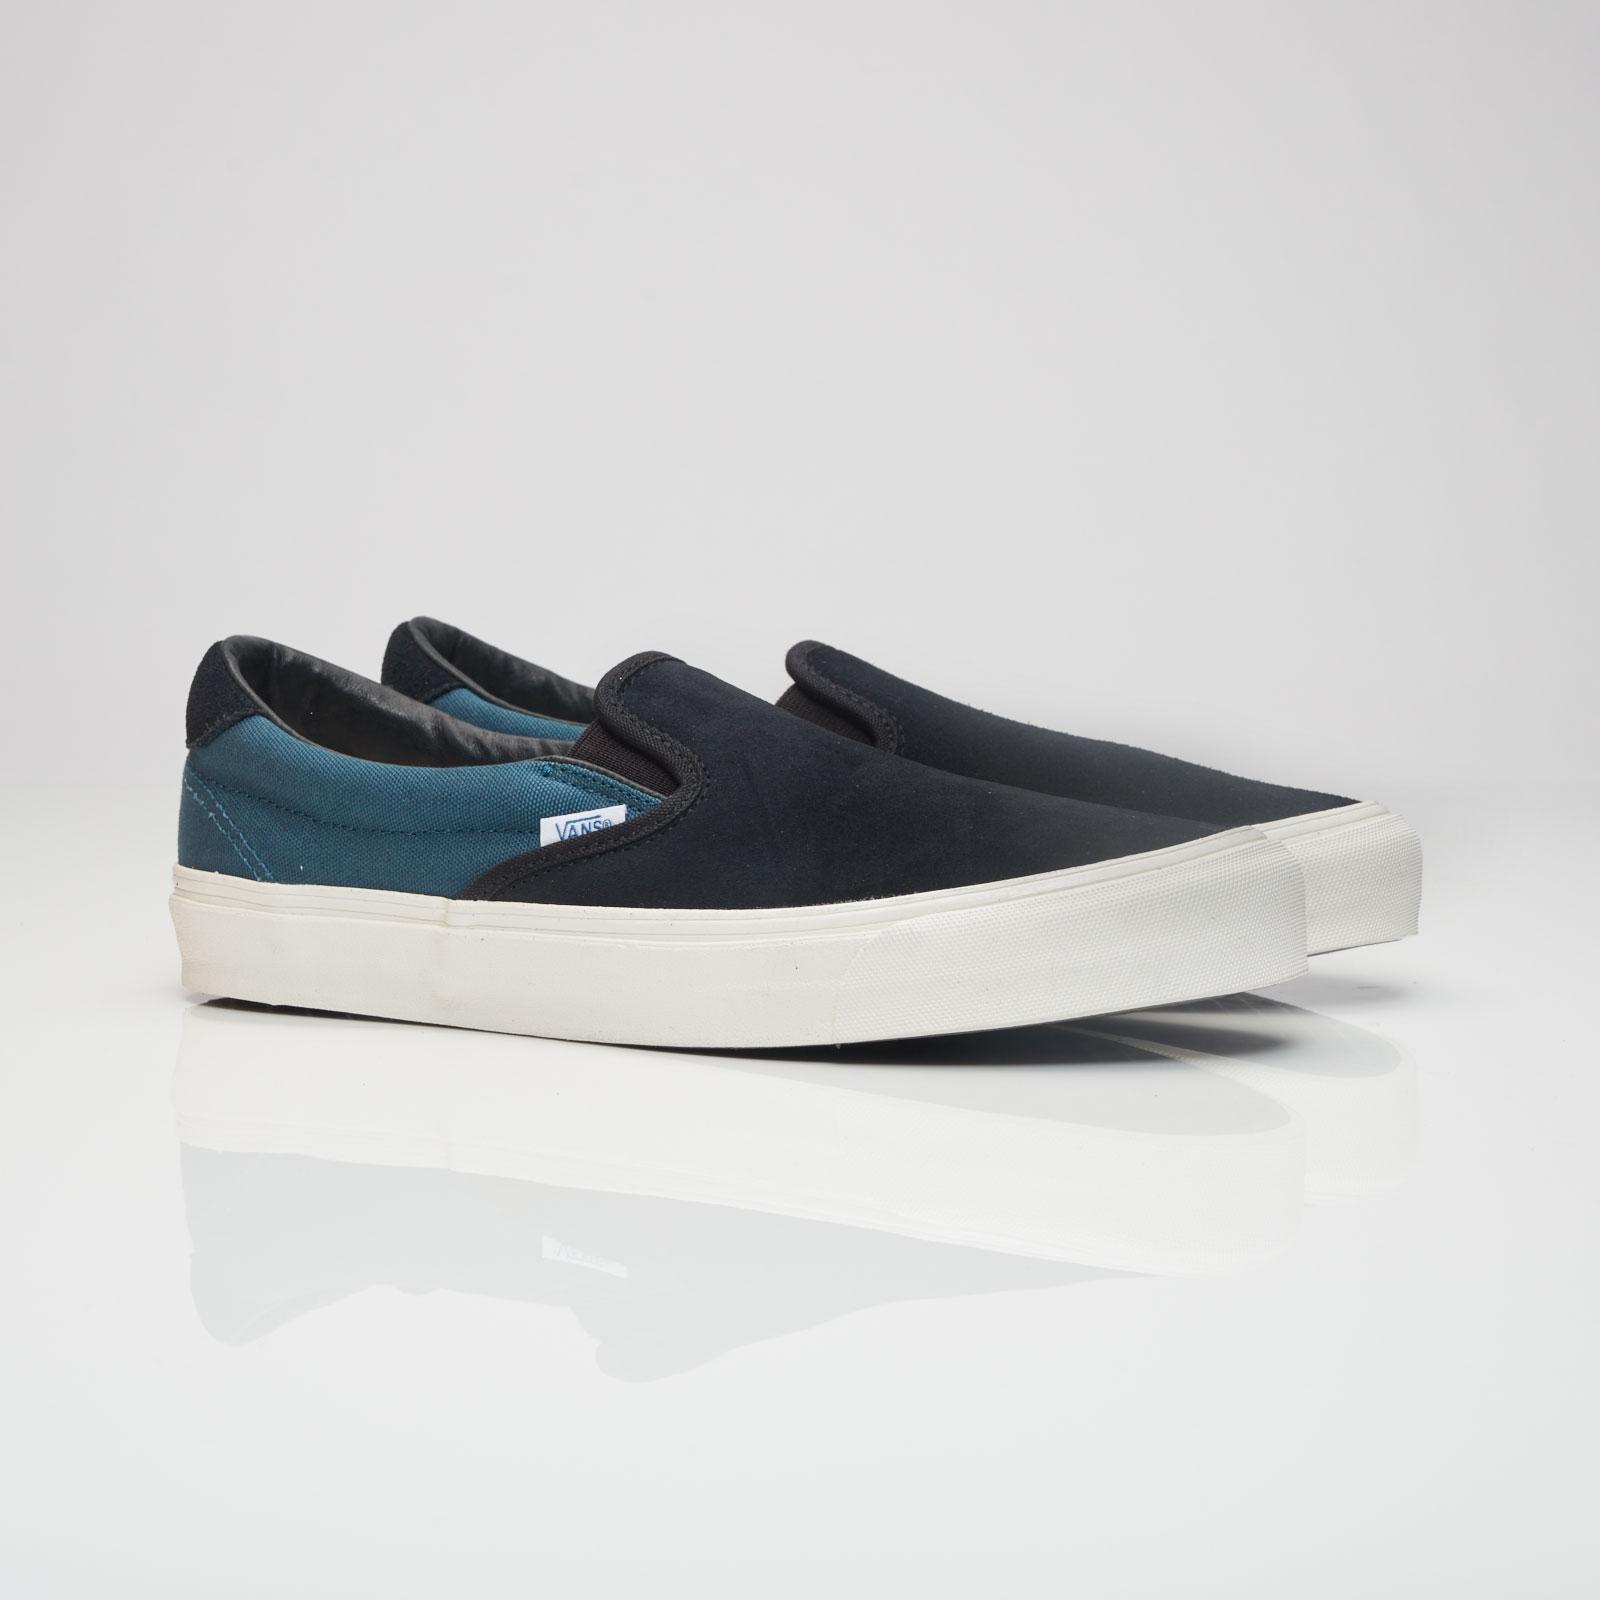 Reebok Classics Blue Suede OG 59 LX Slip-On Sneakers Qaeab87u